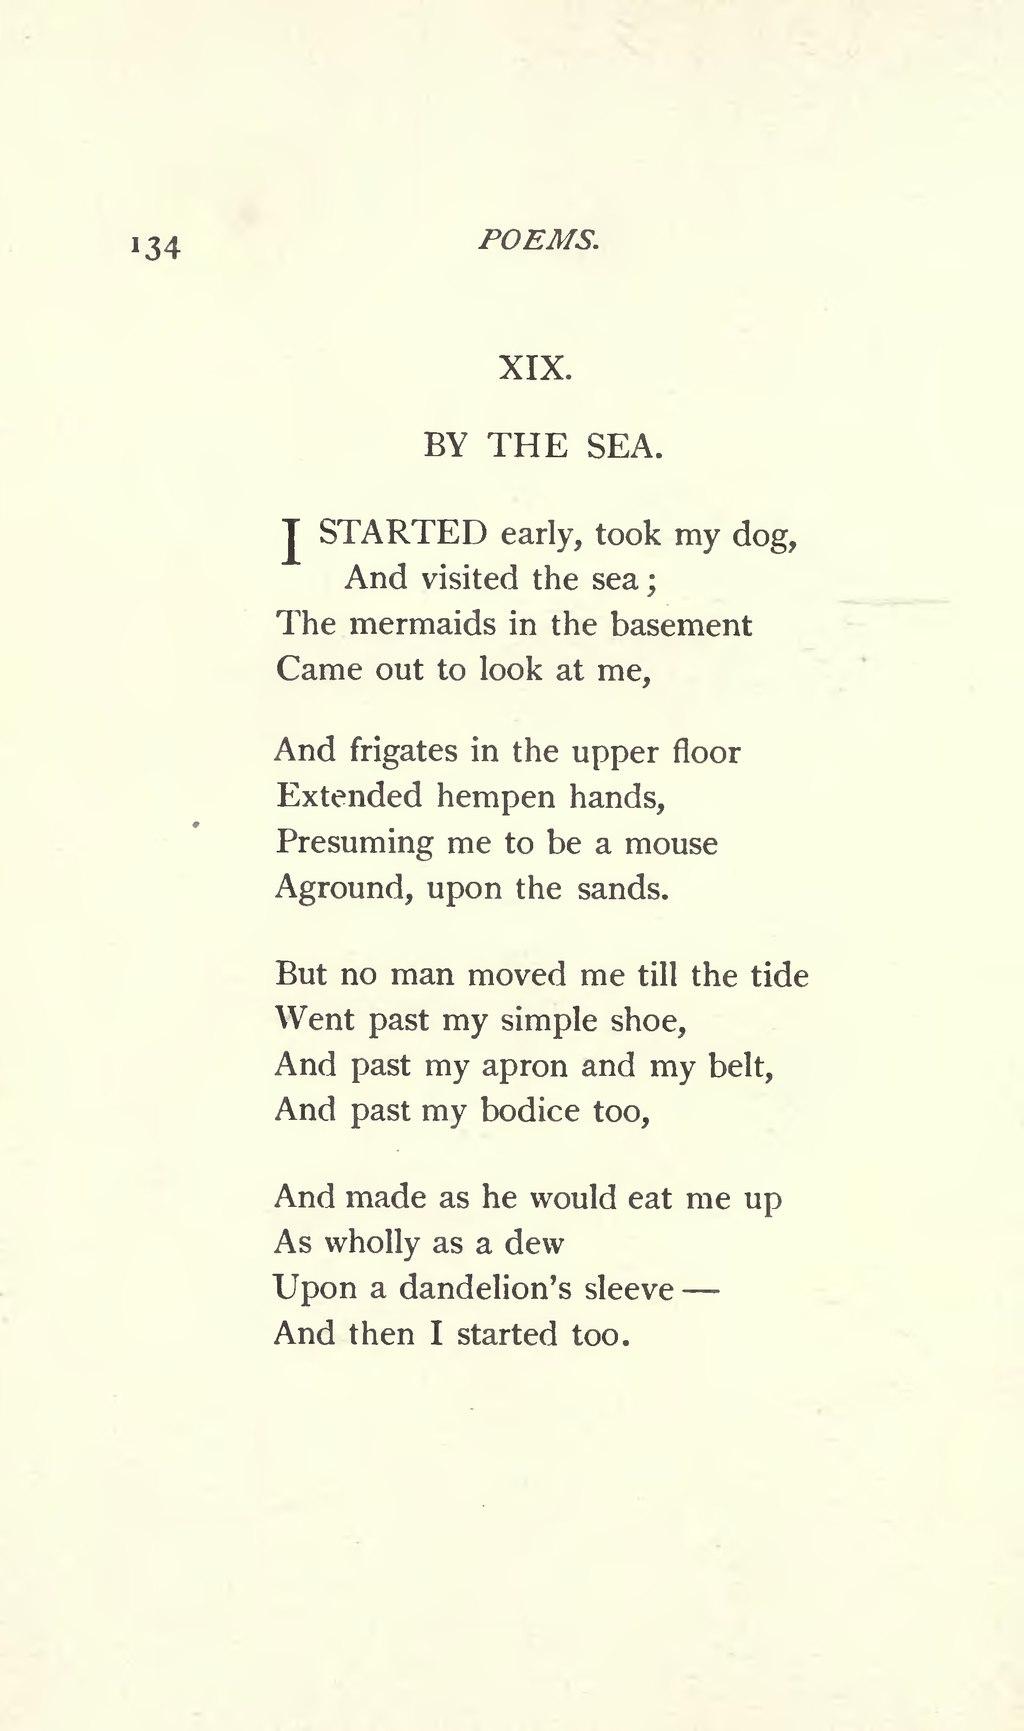 Page Emily Dickinson Poems Second Series 1891 Djvu 142